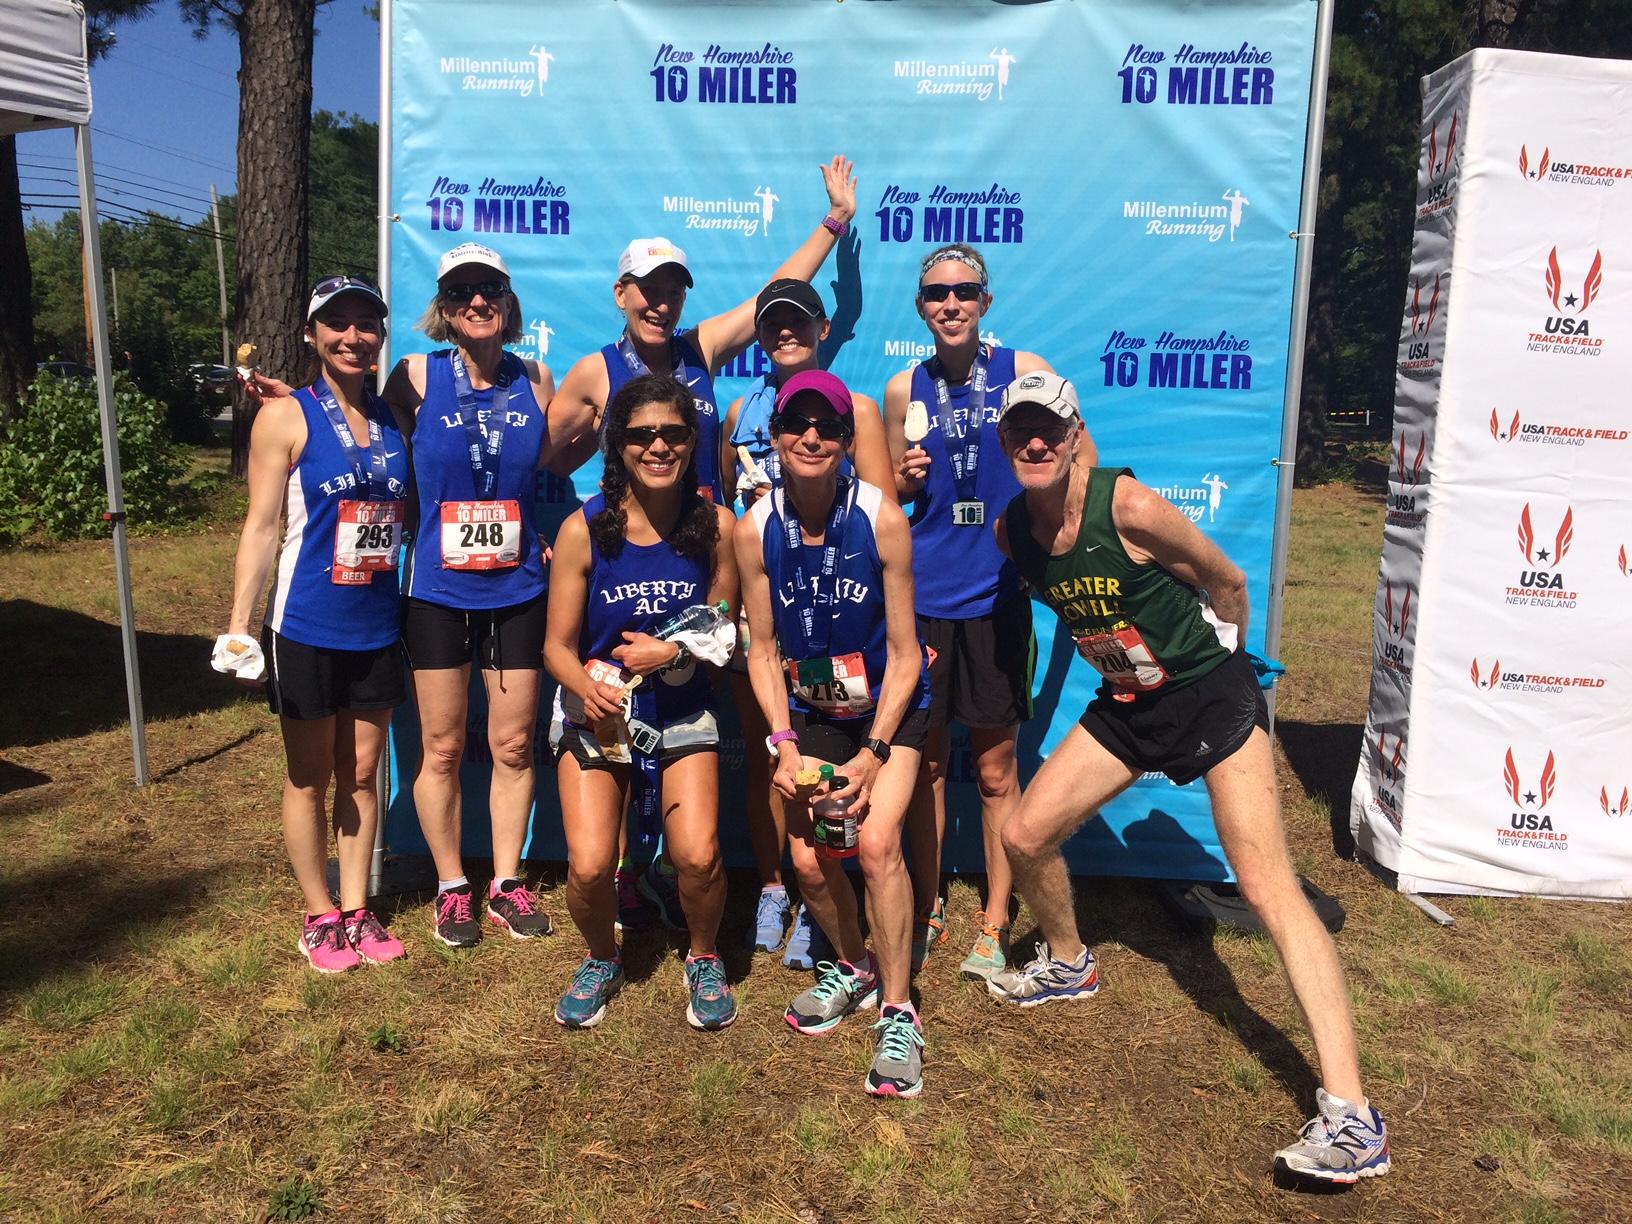 New Hampshire 10 Miler, 2016